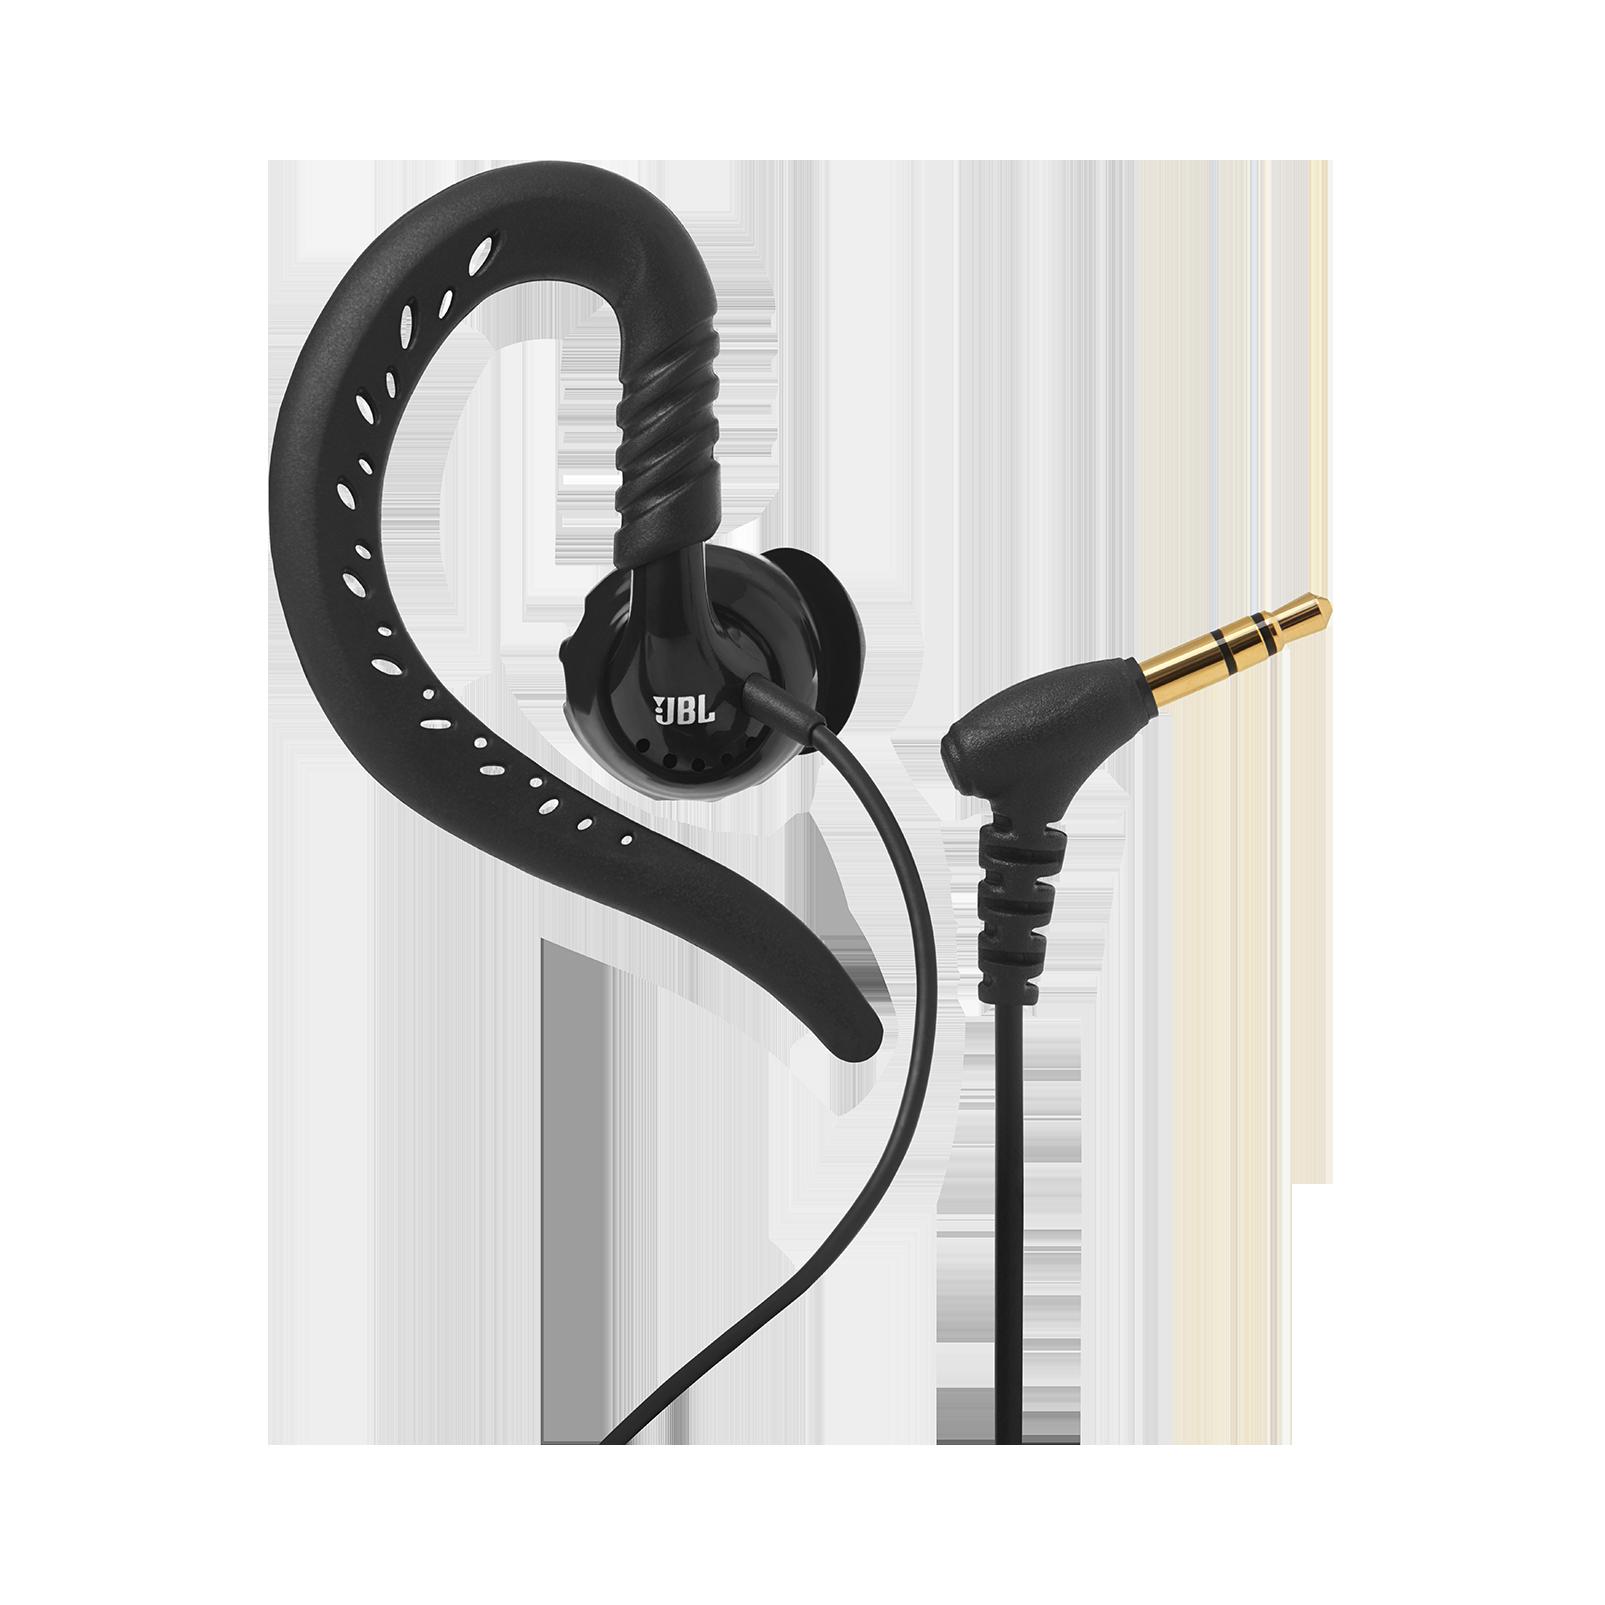 JBL Focus 100 - Black - Behind-the-ear, sport headphones with Twistlock™ Technology - Detailshot 1